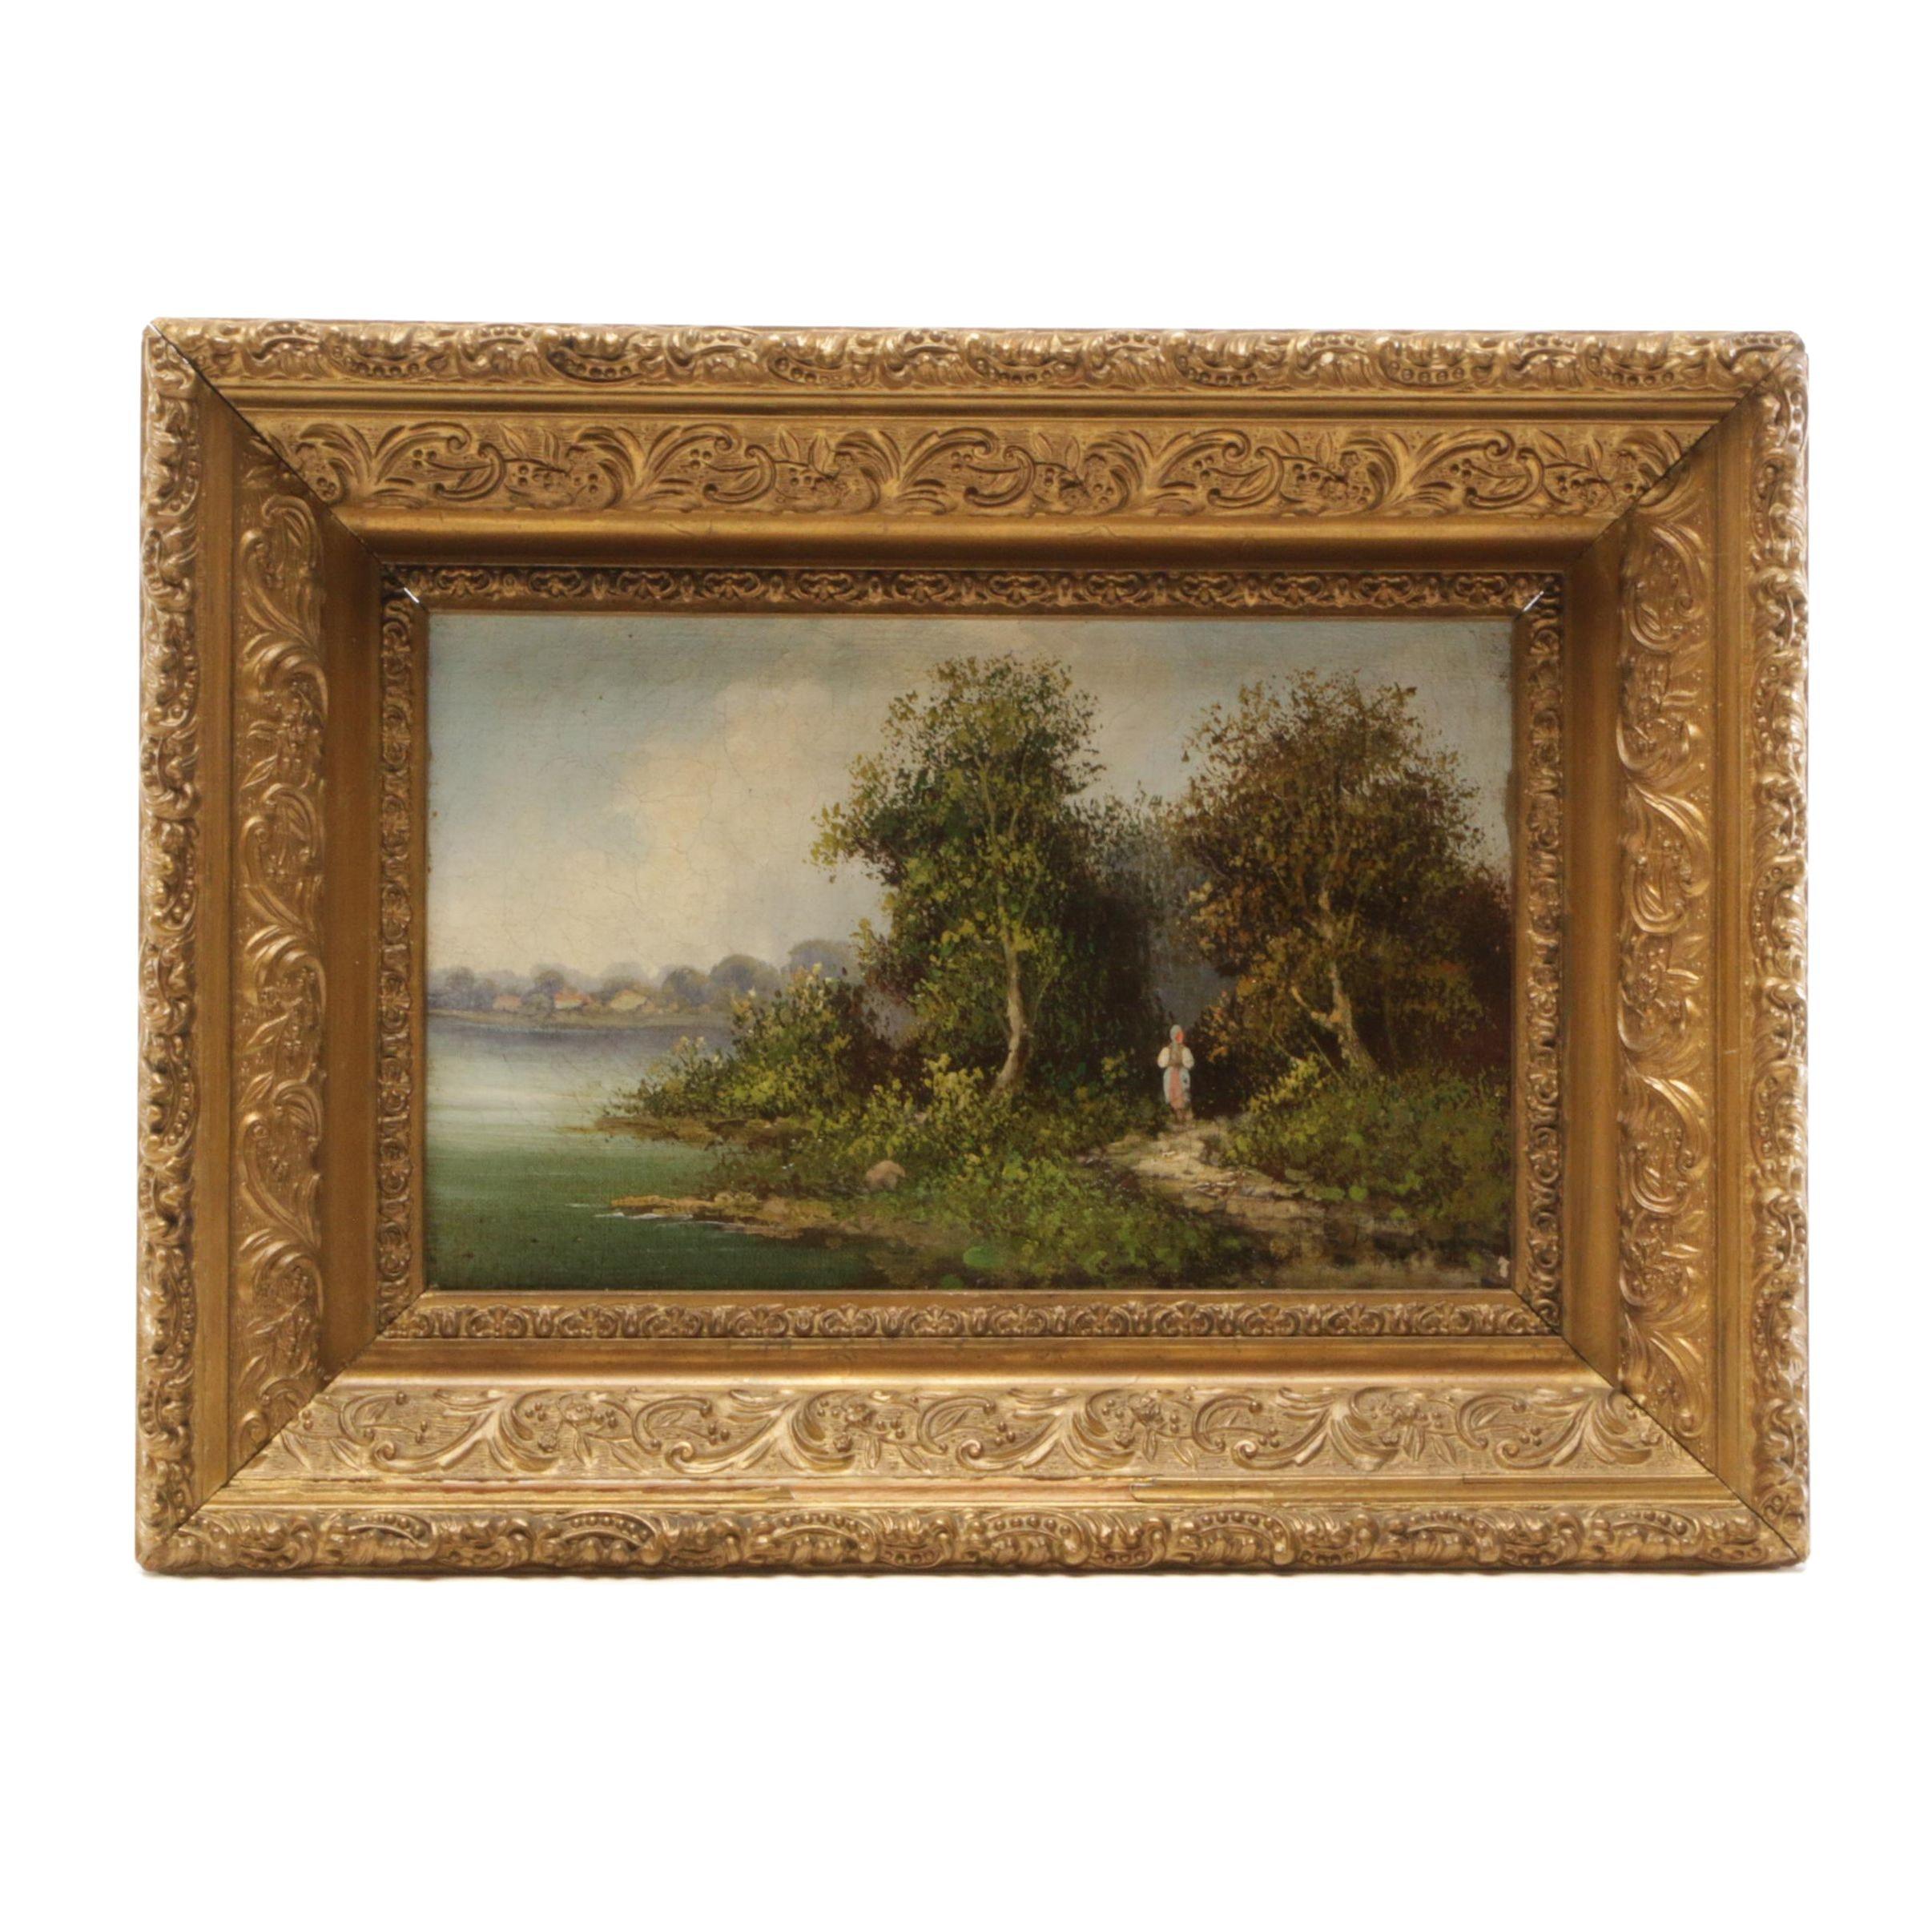 European Oil Painting of Figure in Coastal Scene